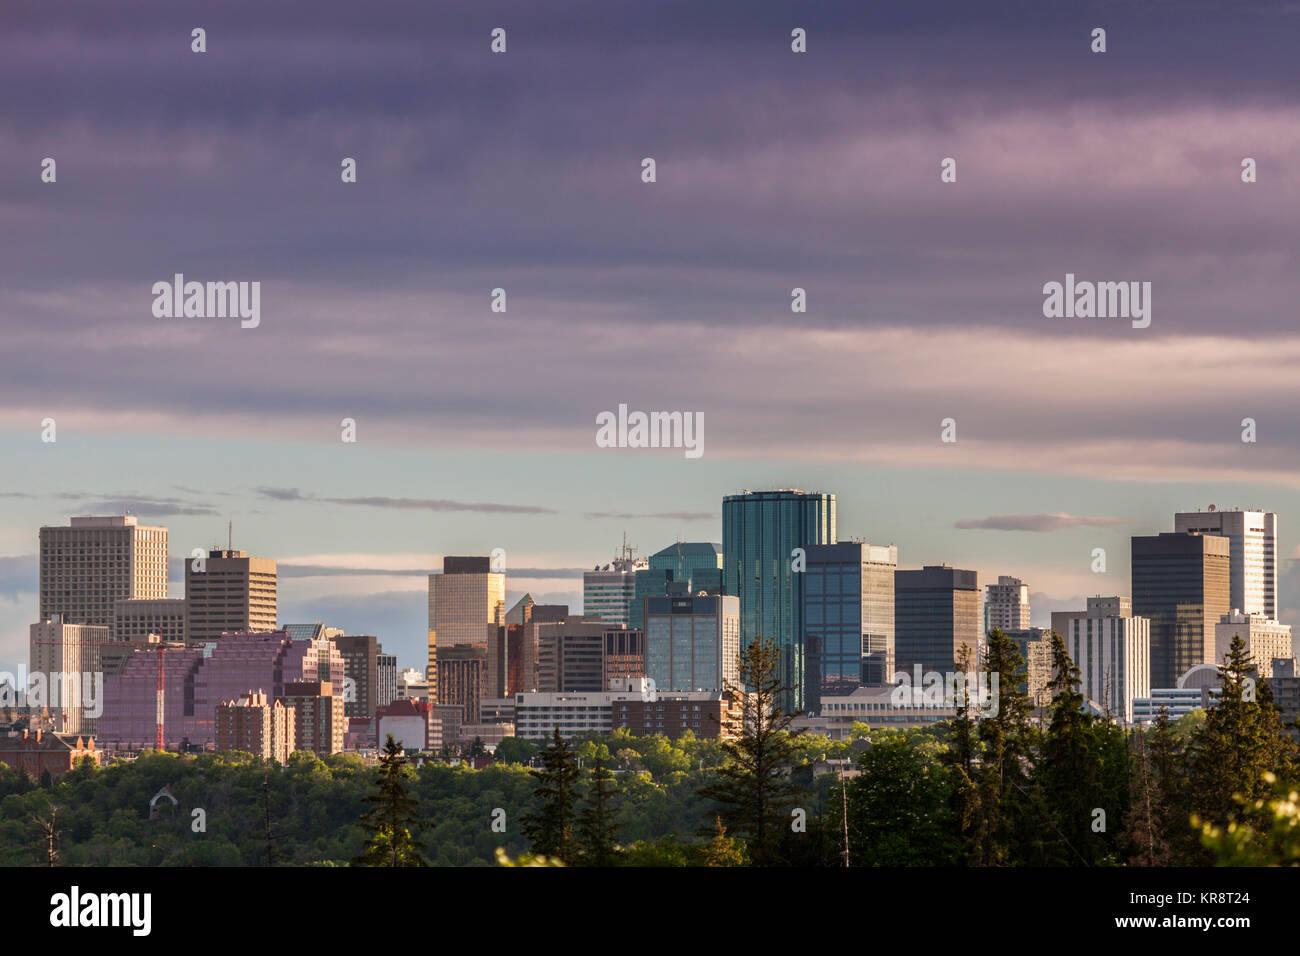 Canada, Alberta, Edmonton, Cityscape with moody sky - Stock Image